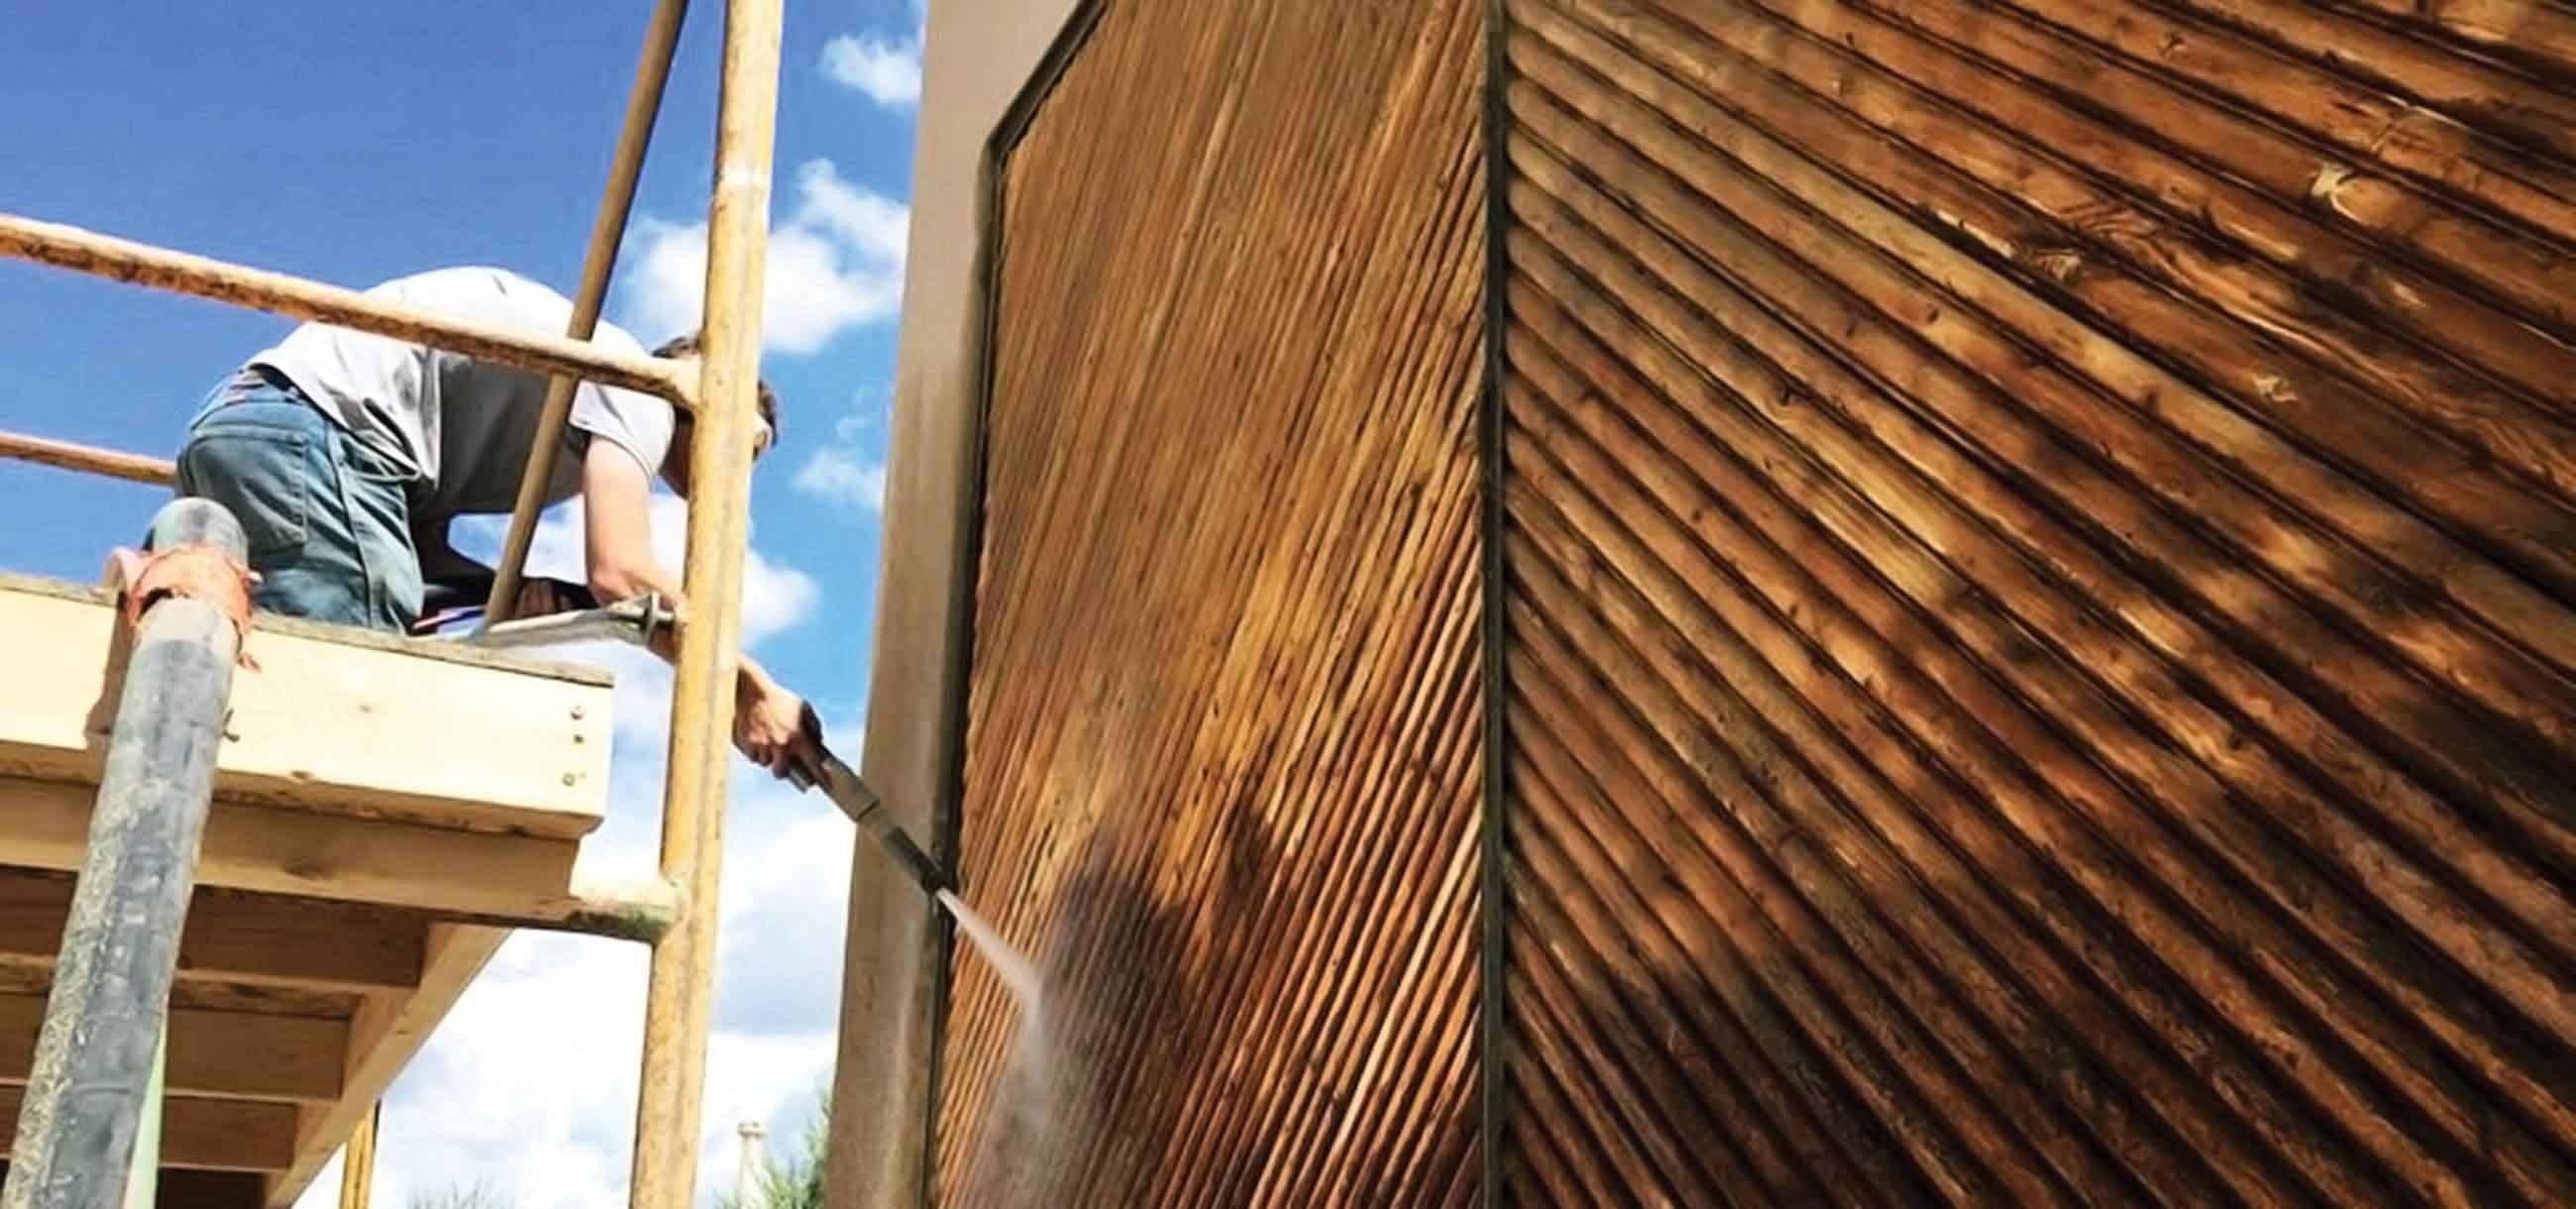 dustless blasting wood panels